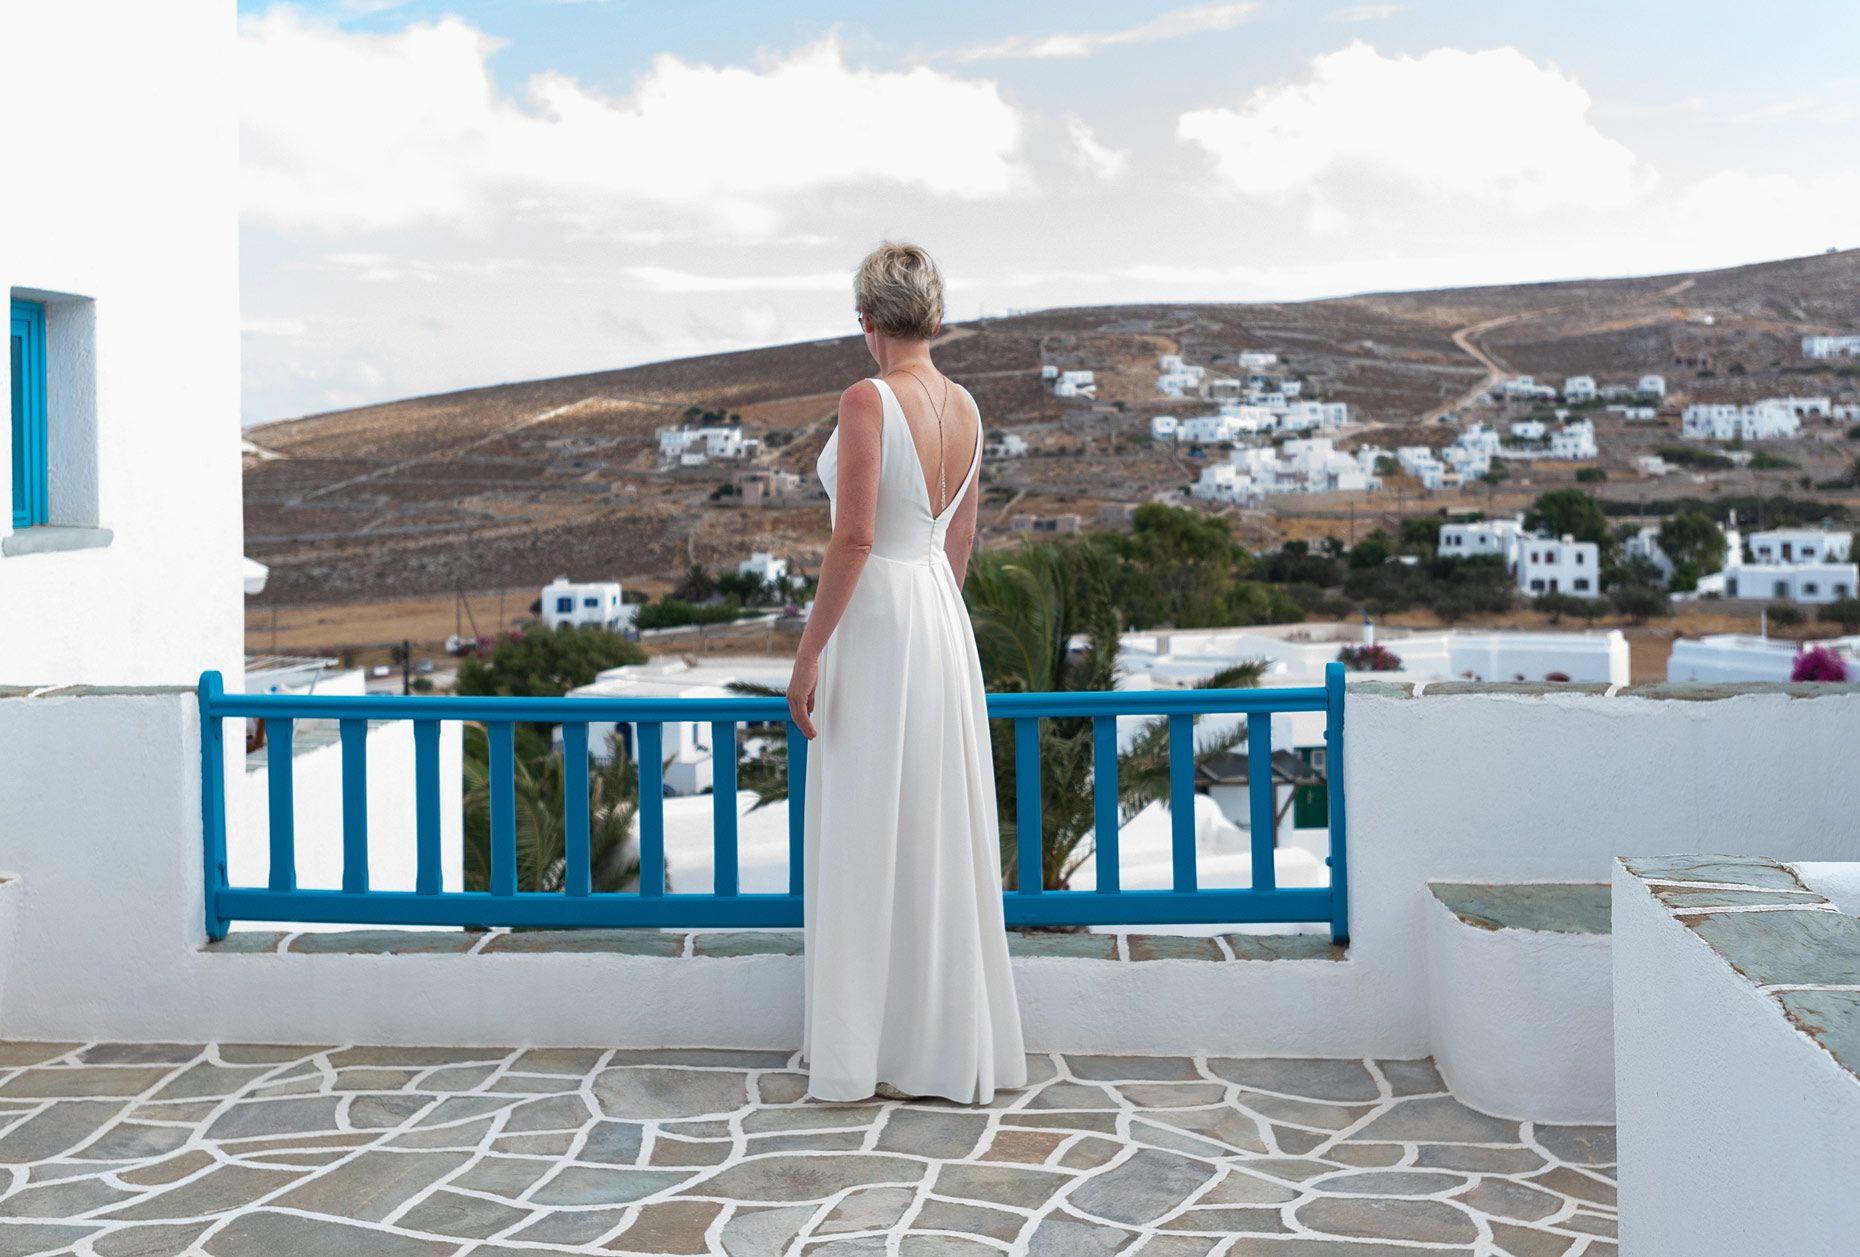 #folegandroswedding #weddingday #weddingphotography #l4l #love #weddinggreekisland #weddingdayphotos #weddingdaystory #weddingdaybliss #weddingdetails #sea #sun #islandlife